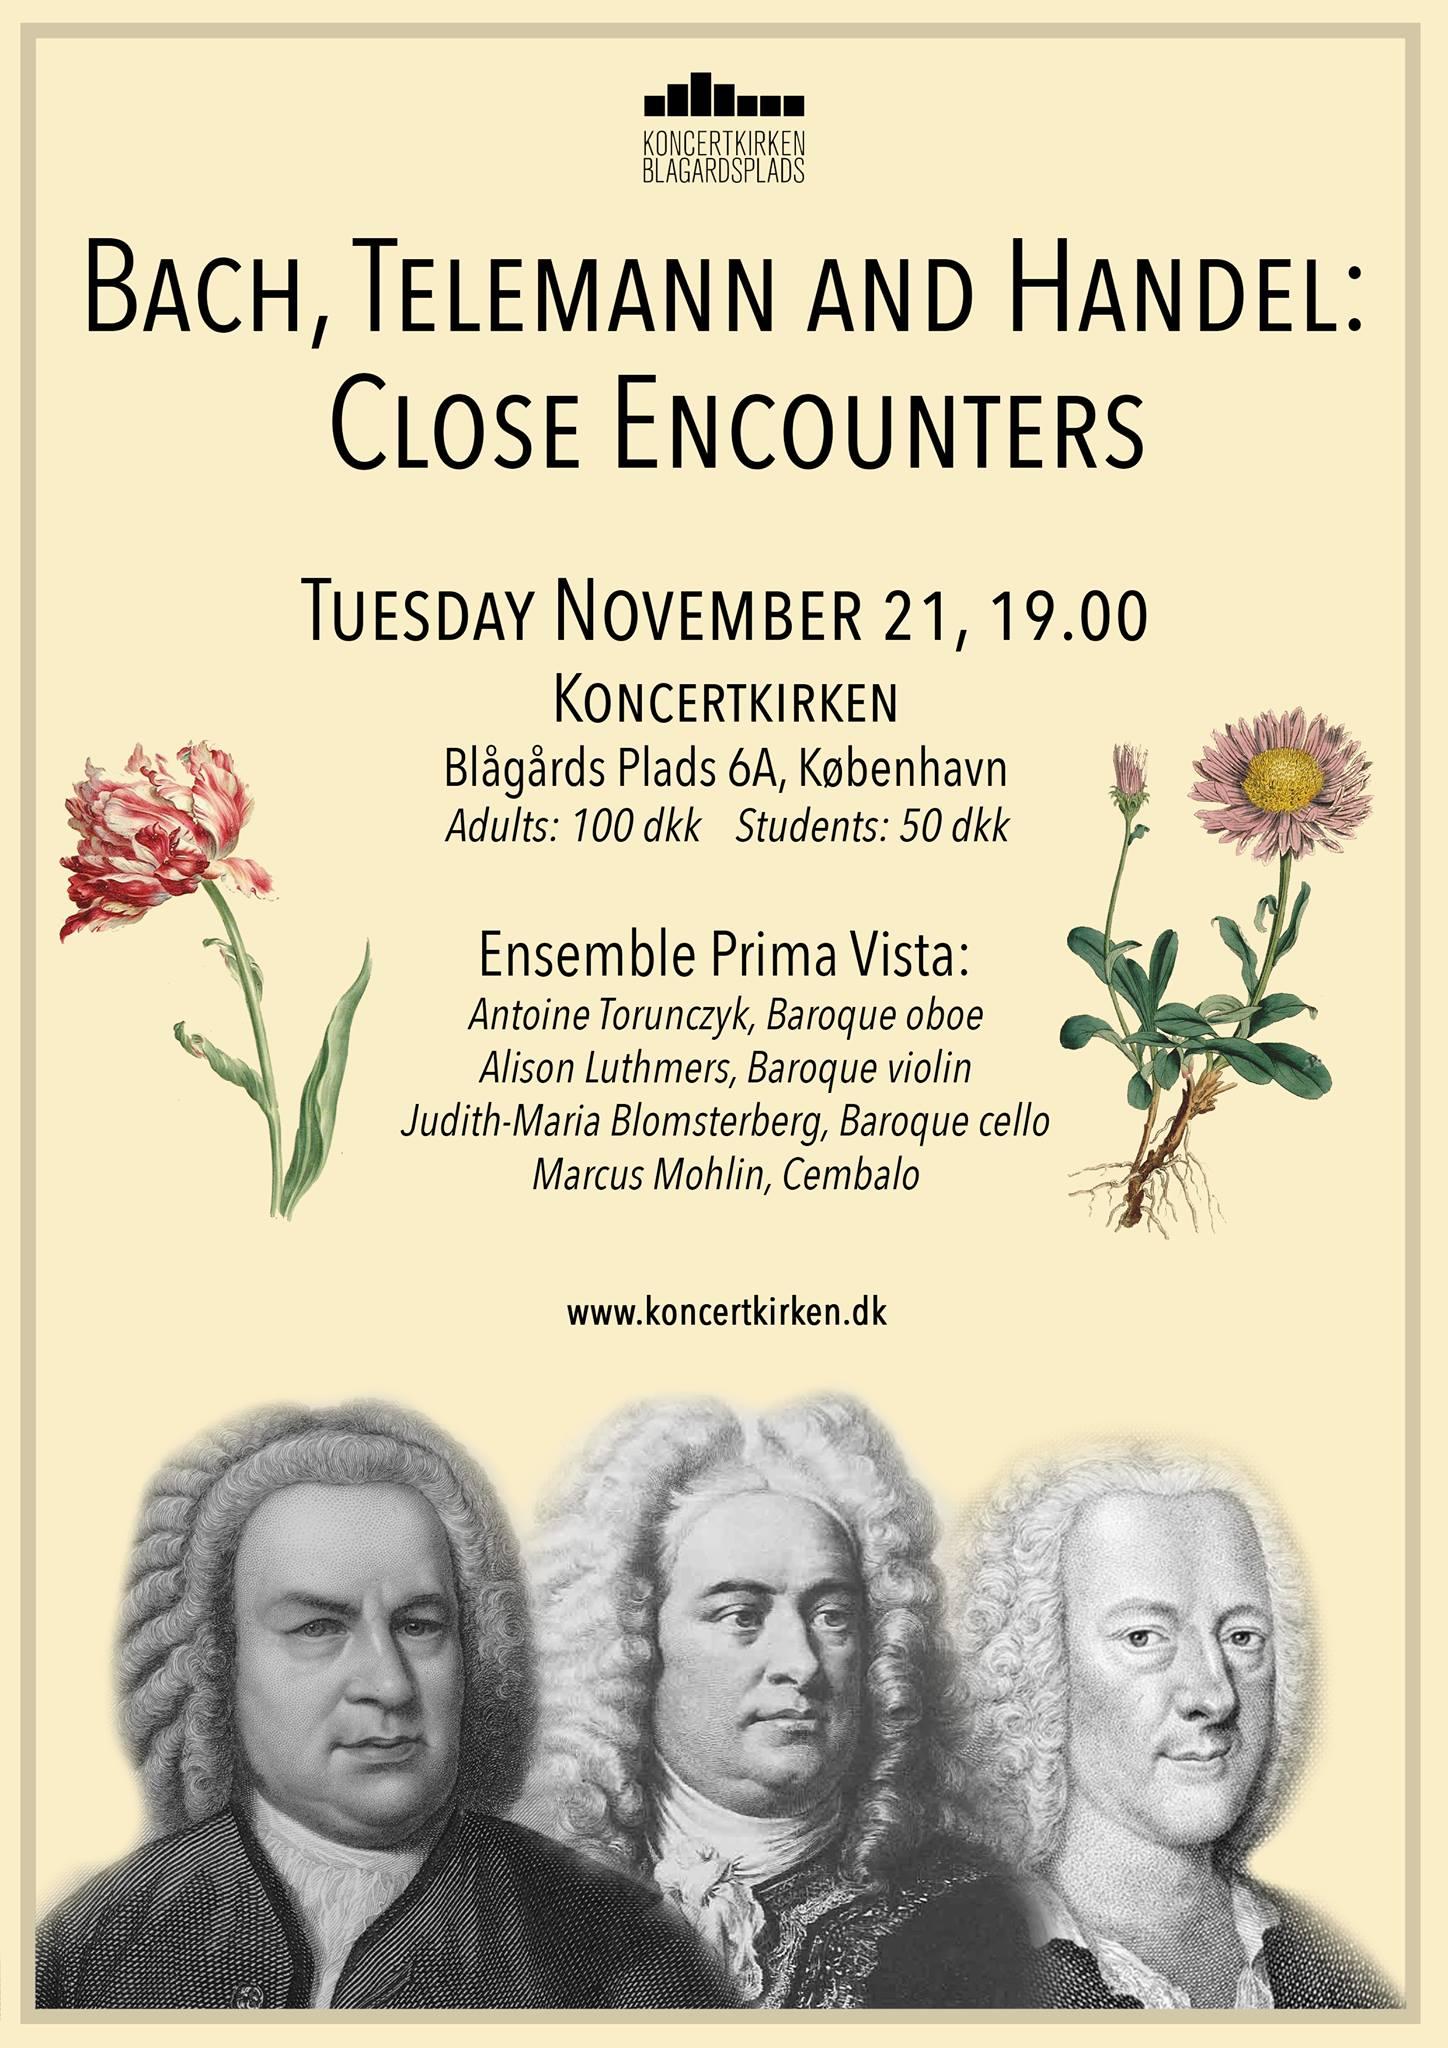 A Comparative Study between Johann Sebastian Bach and George Frideric Handel